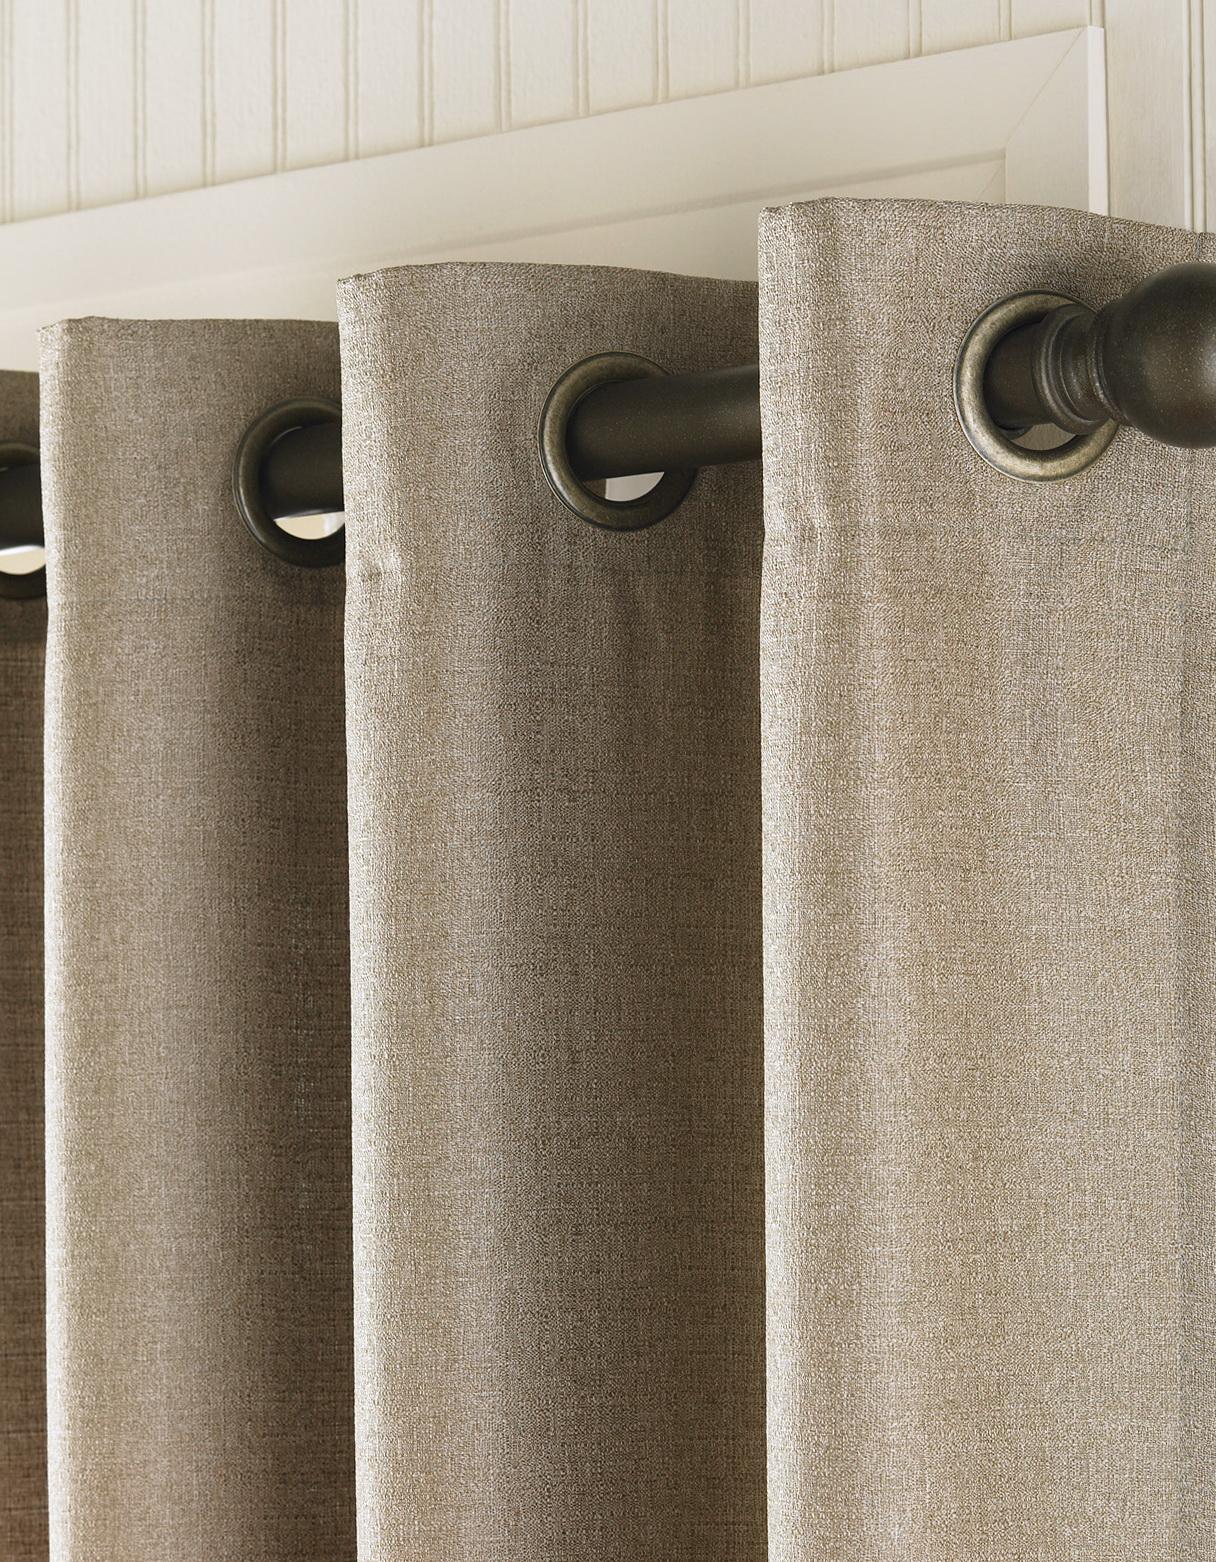 Curtain Rods For Grommet Drapes Home Design Ideas